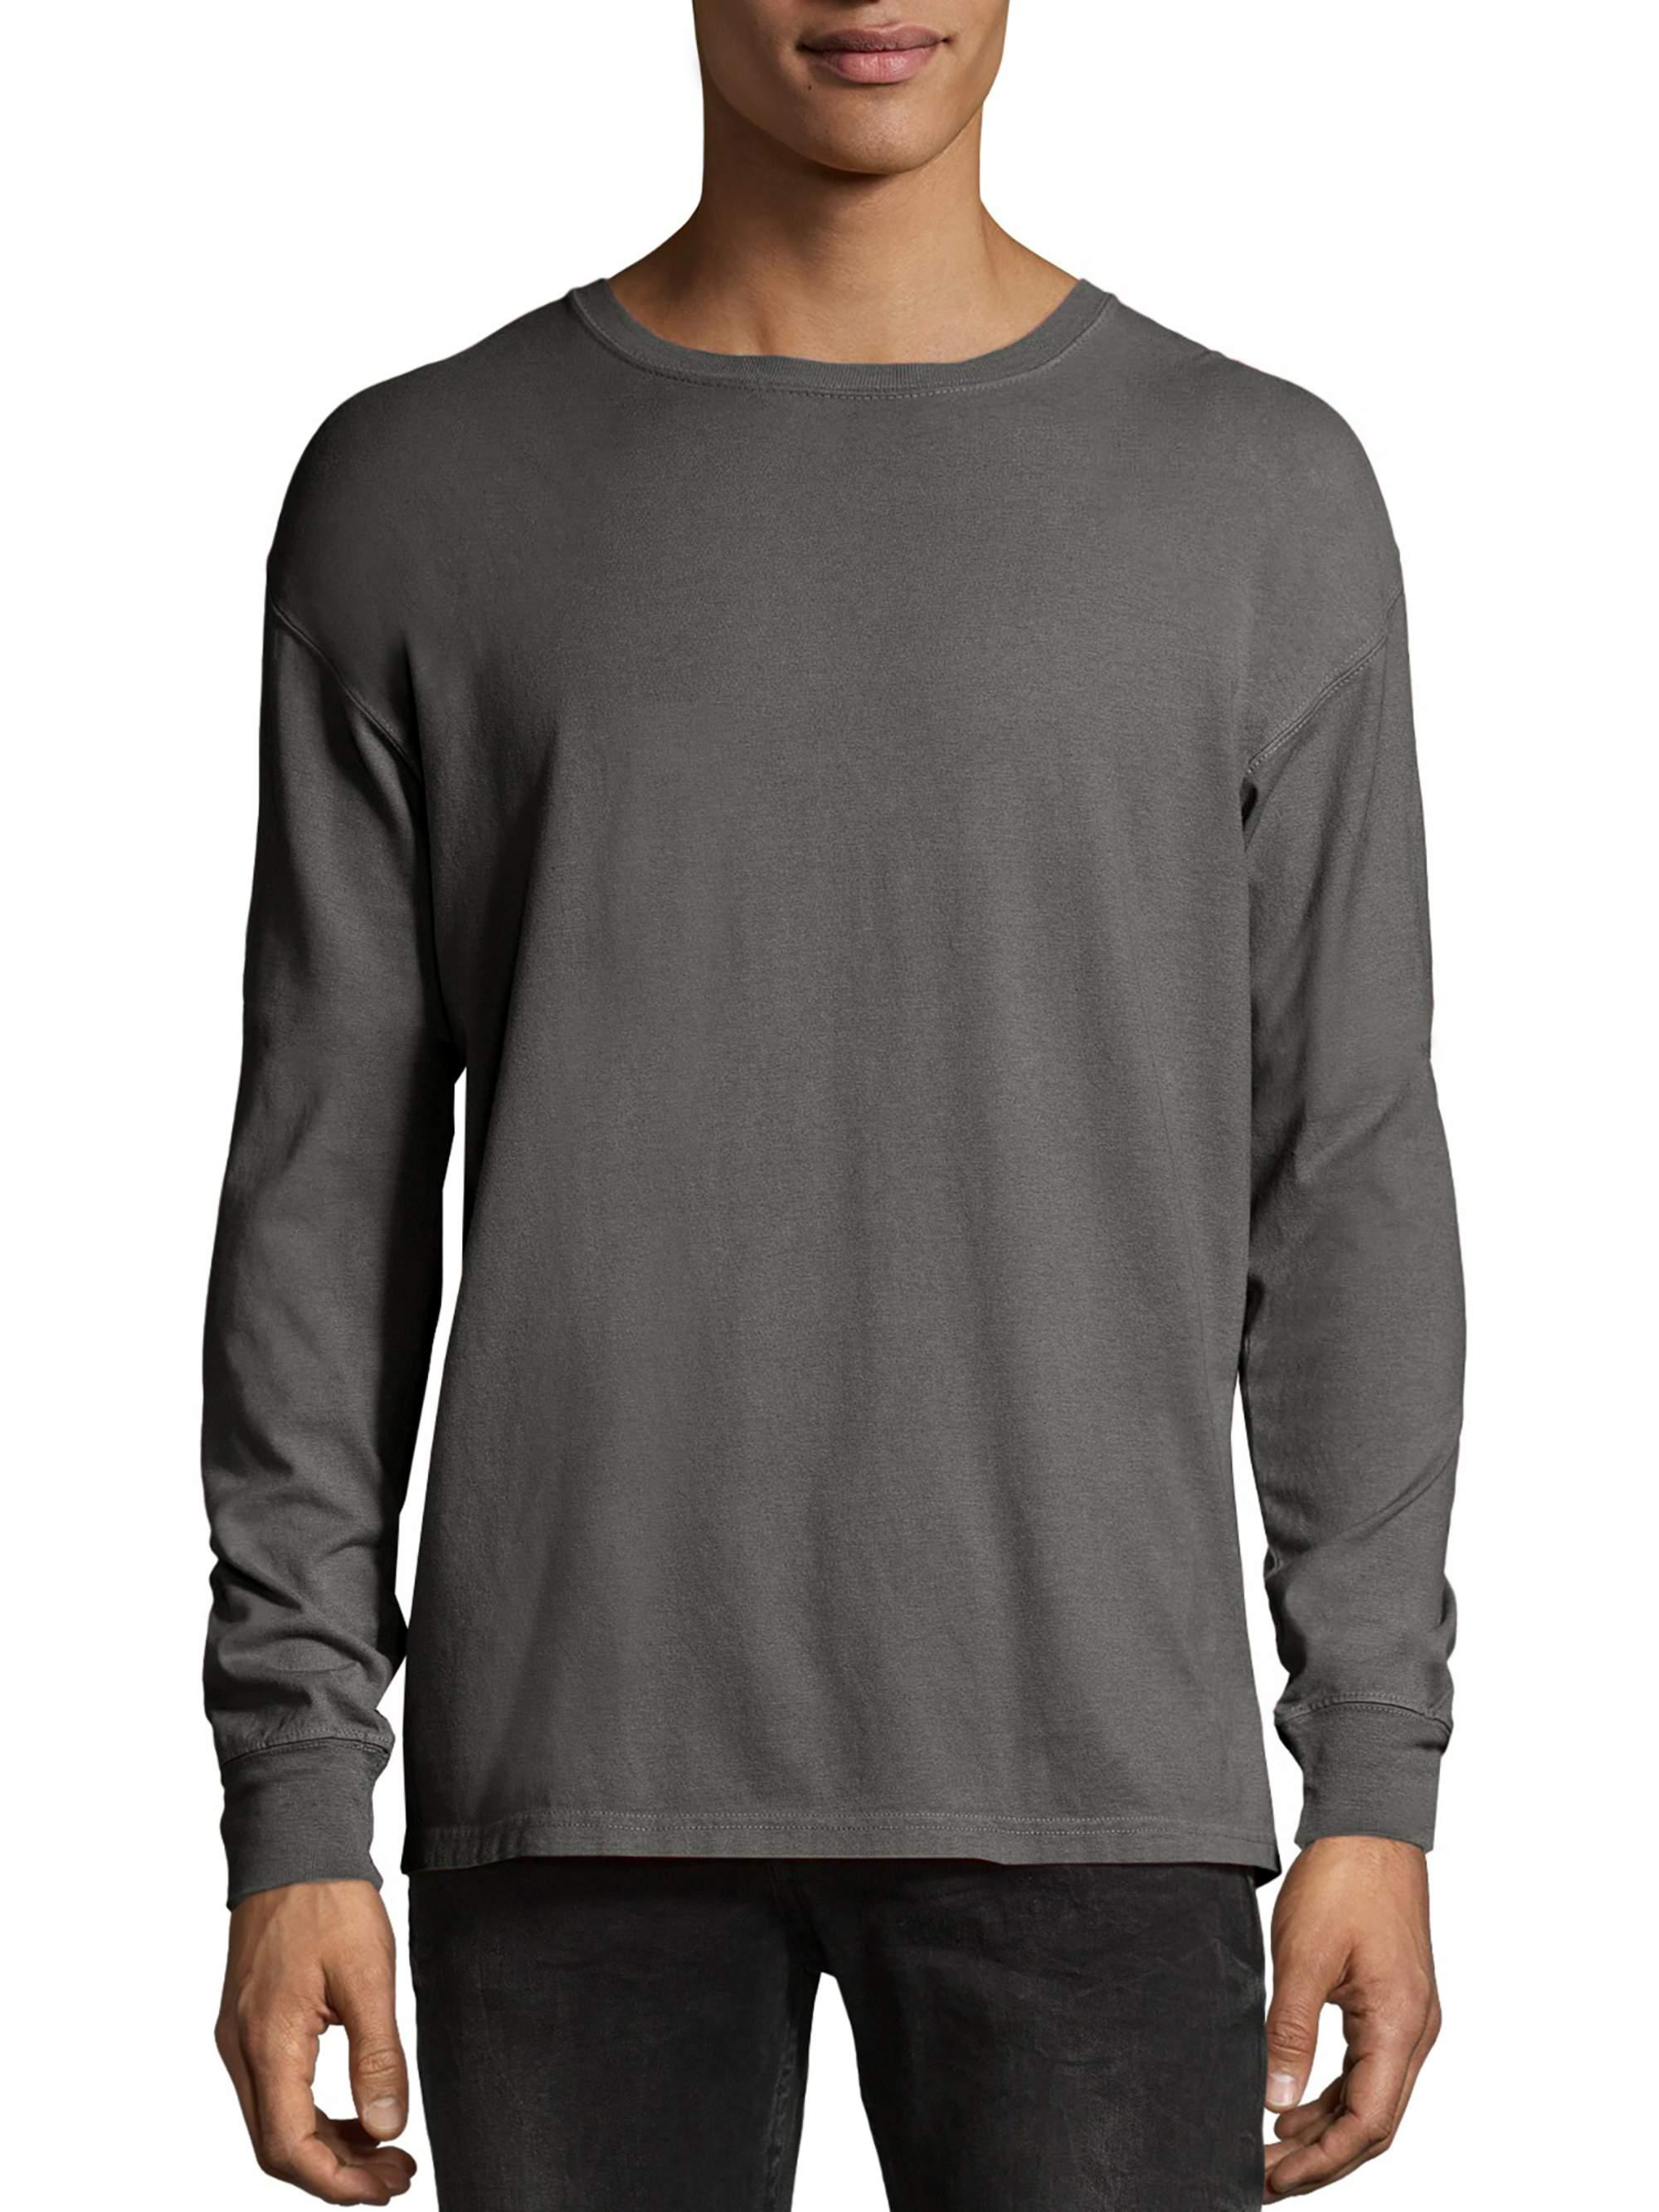 Big Men's ComfortWash Garment Dyed Long Sleeve Tee